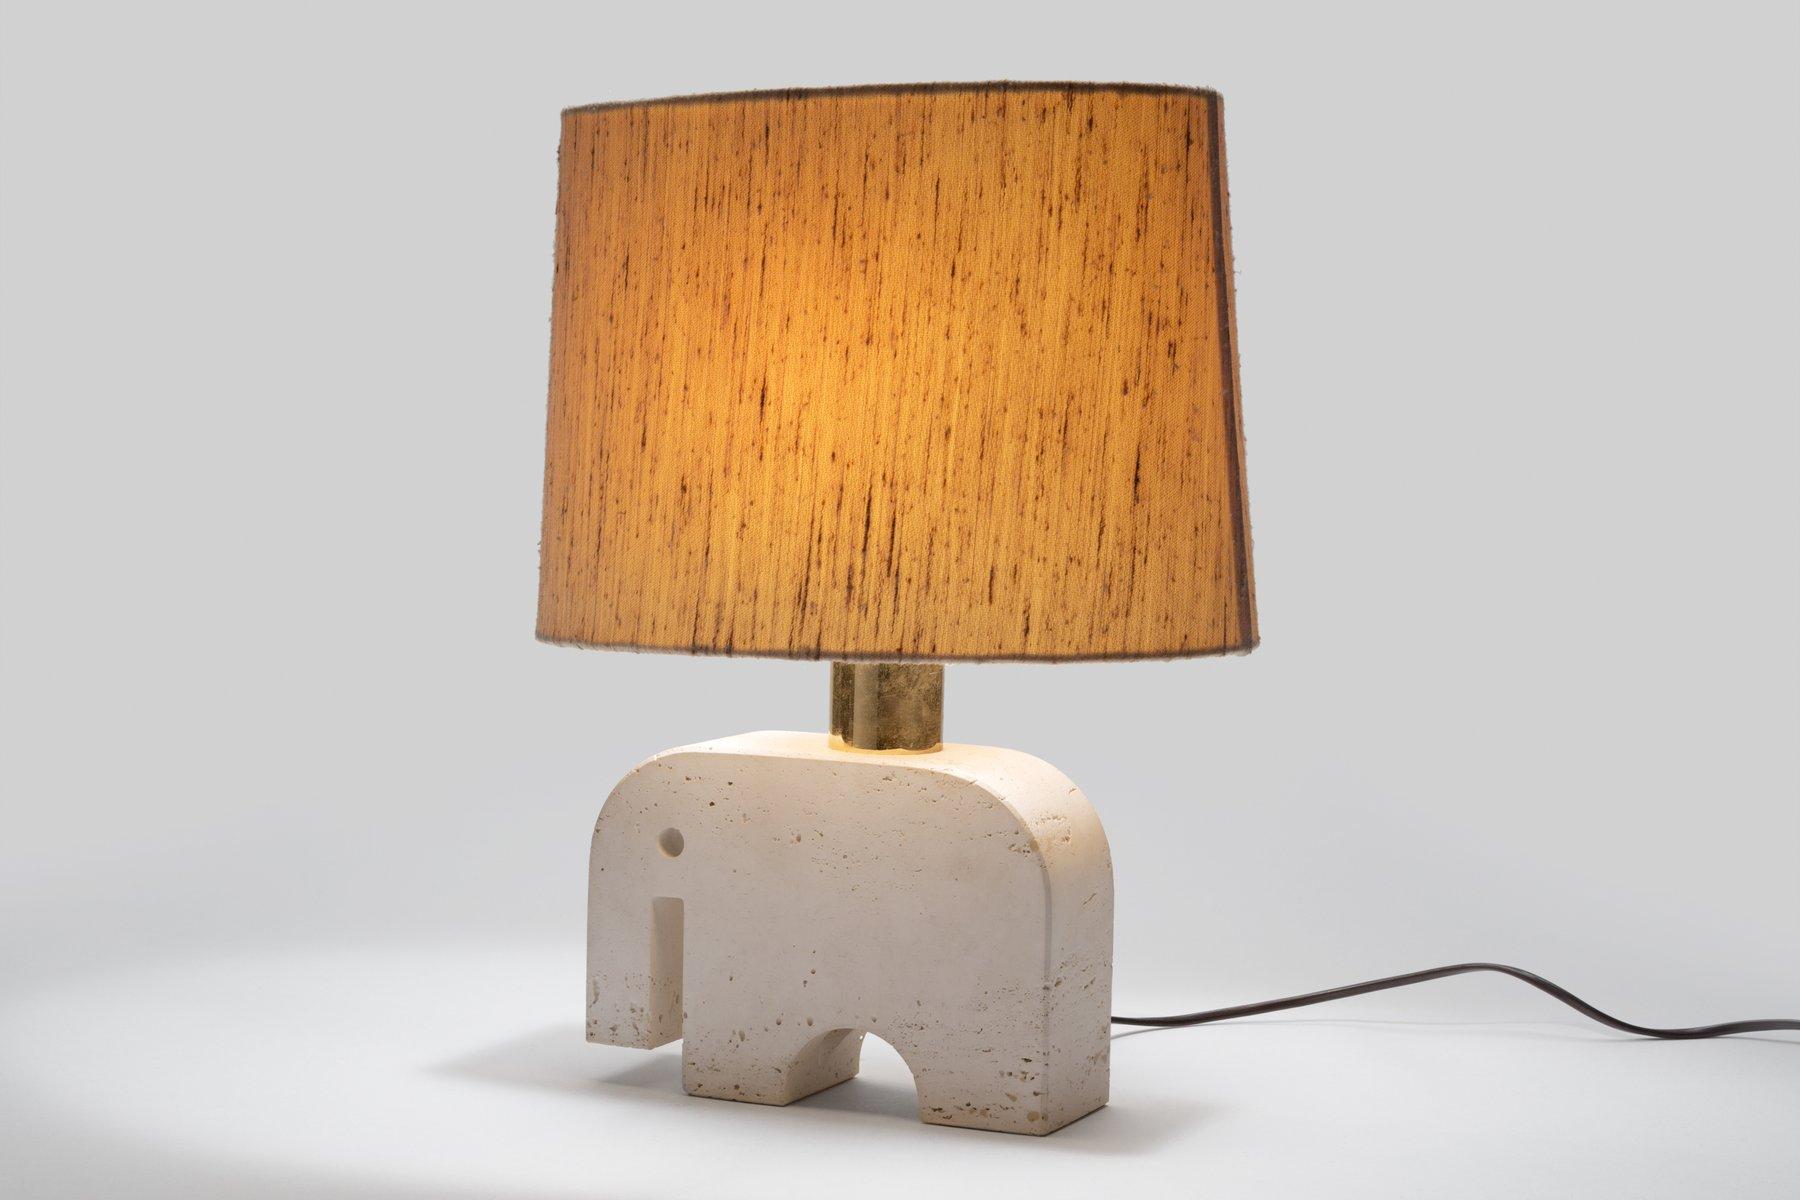 Attractive Italian Travertine Elephant Lamp From Fratelli Minnelli, 1970s